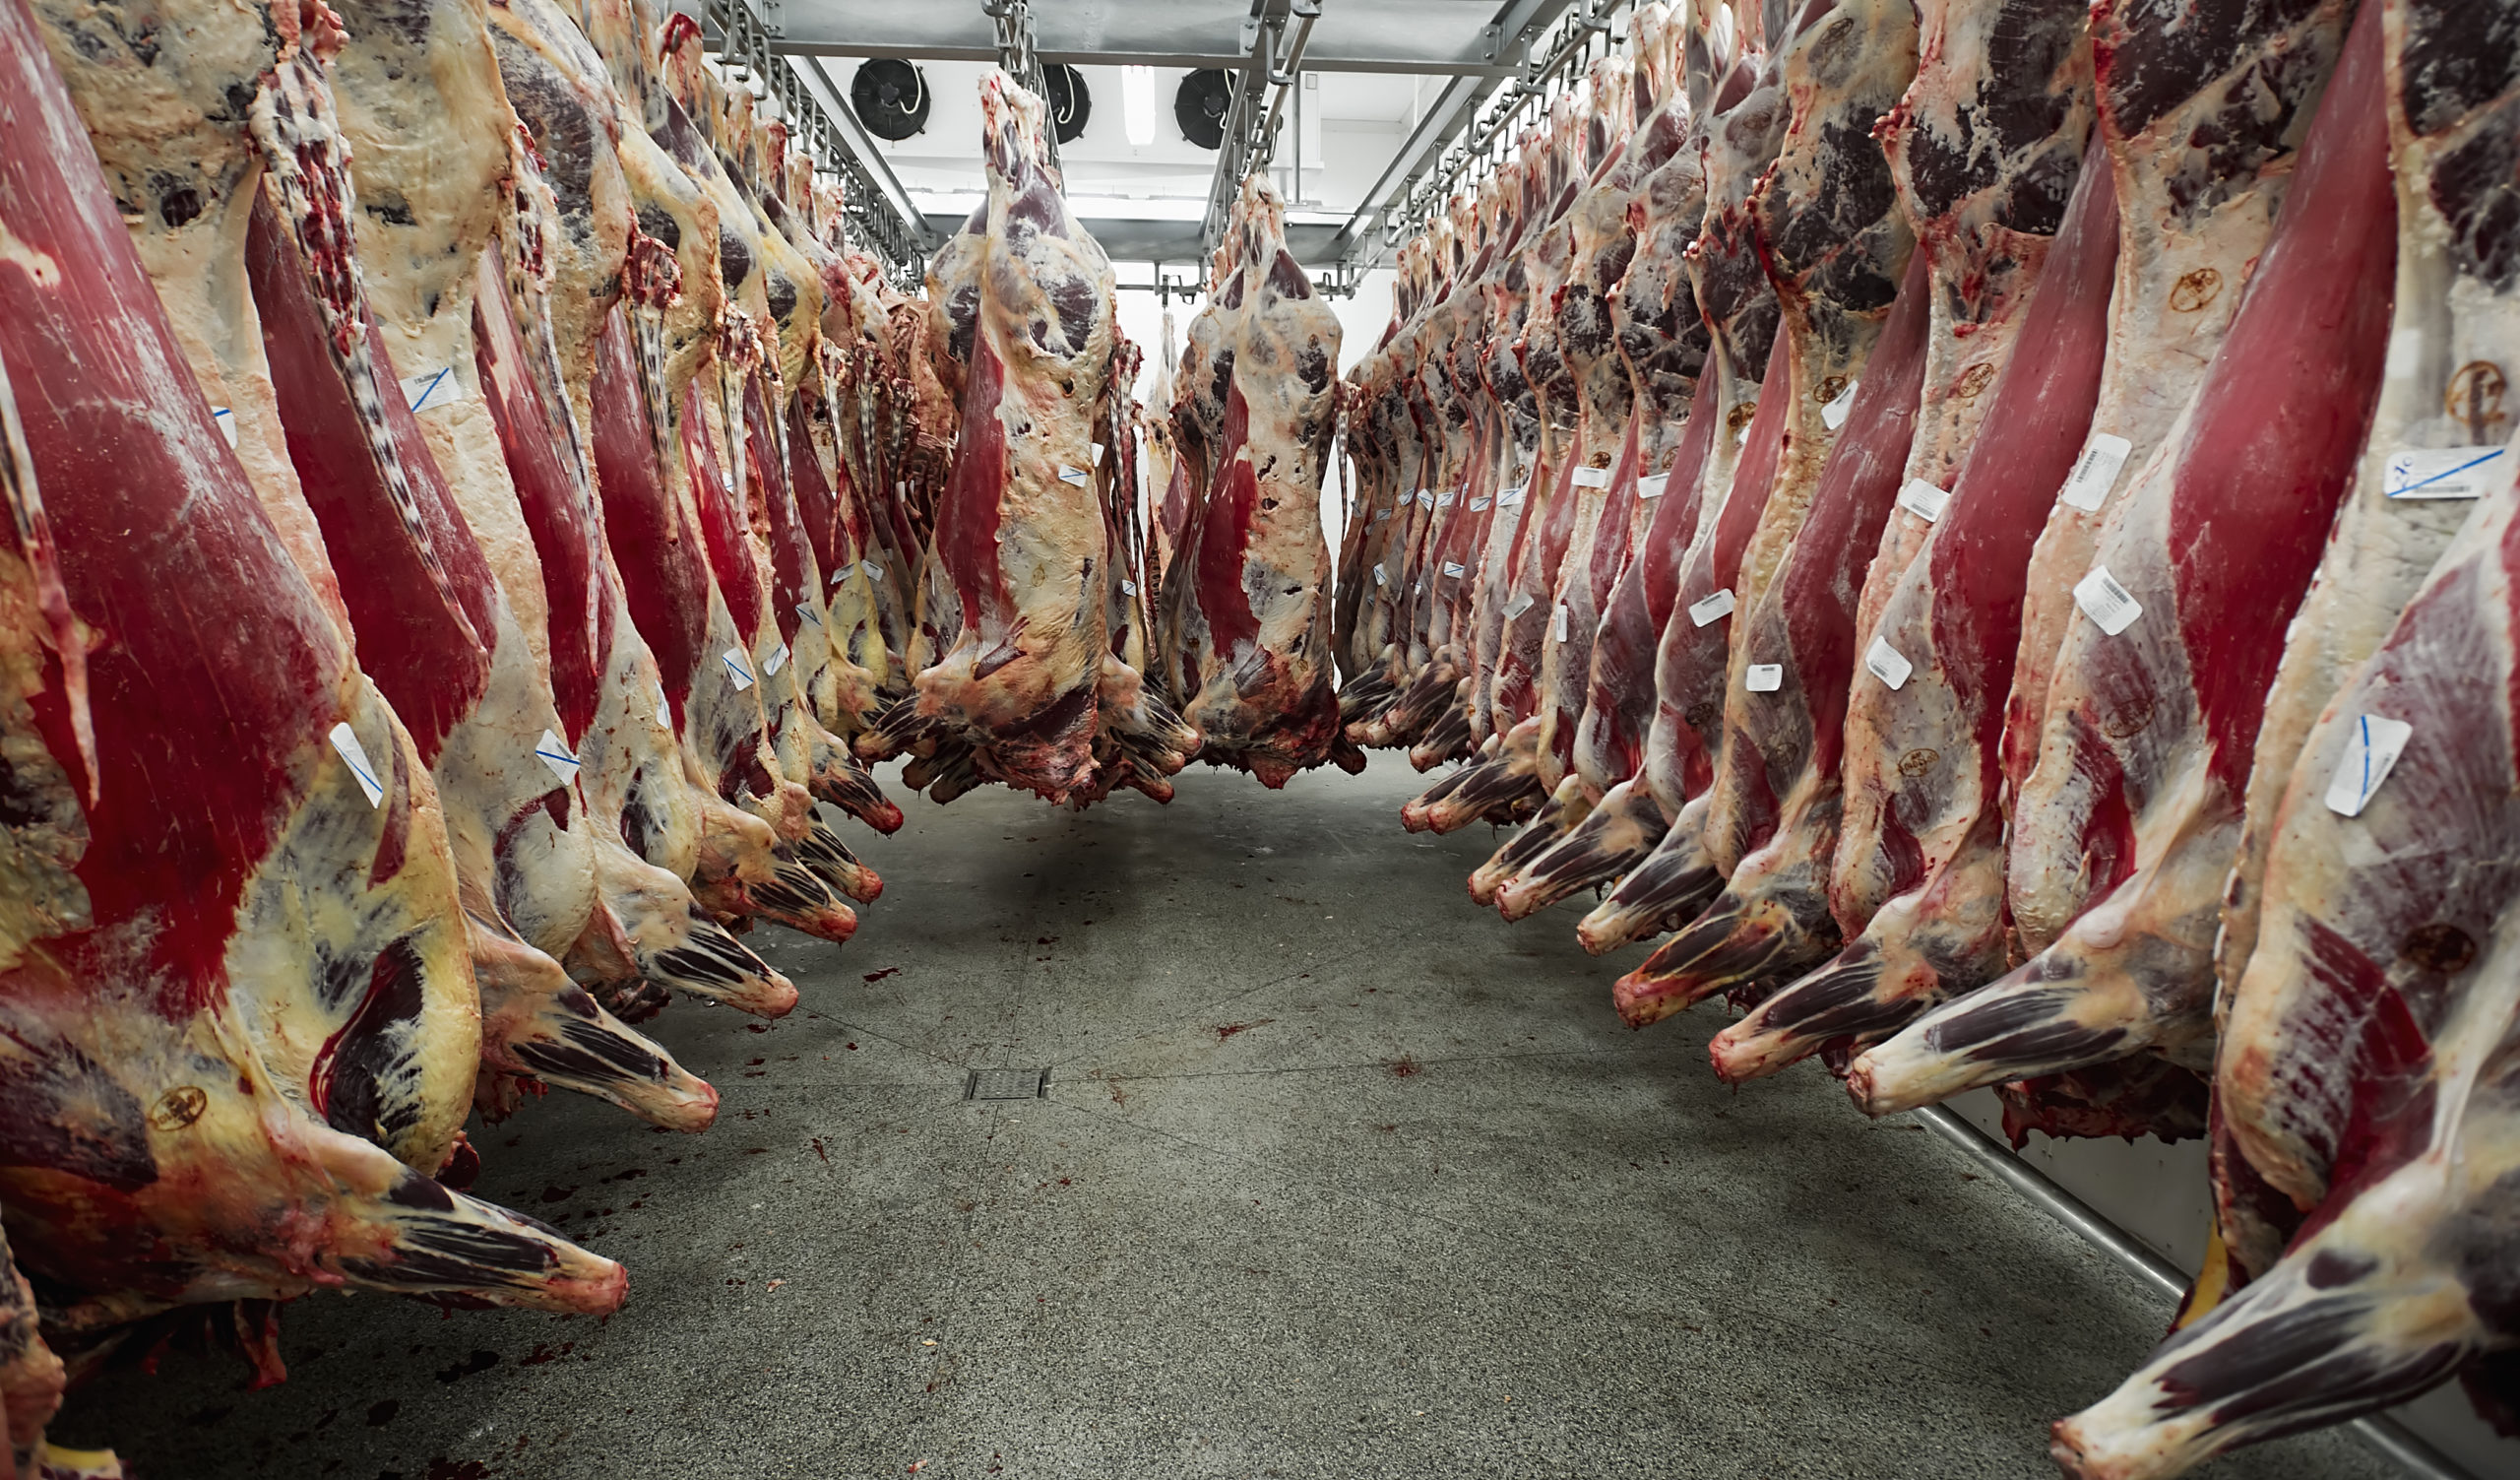 Meat carcasses - Bovine TB